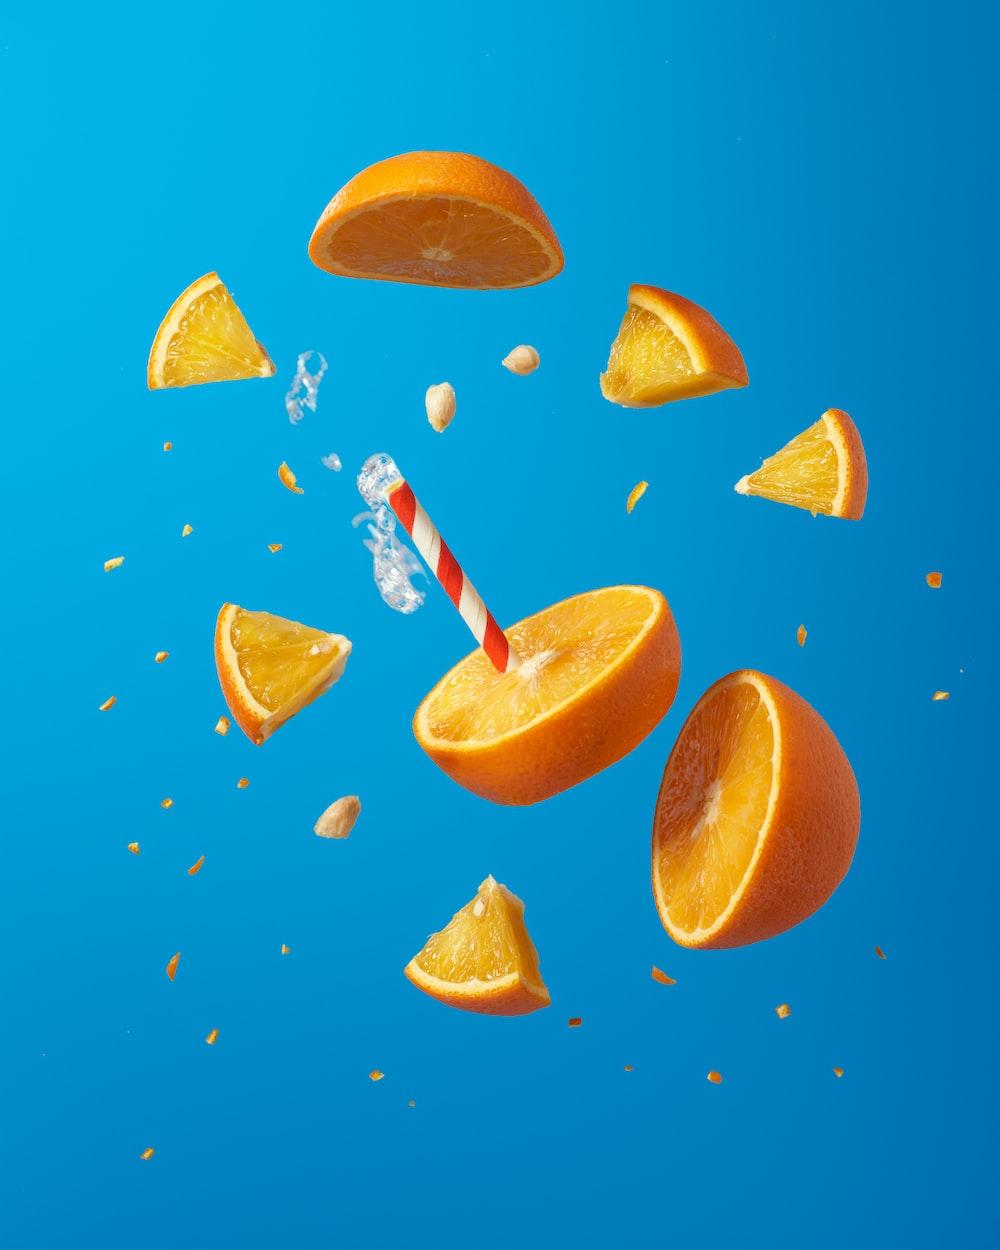 sliced orange fruit on blue surface